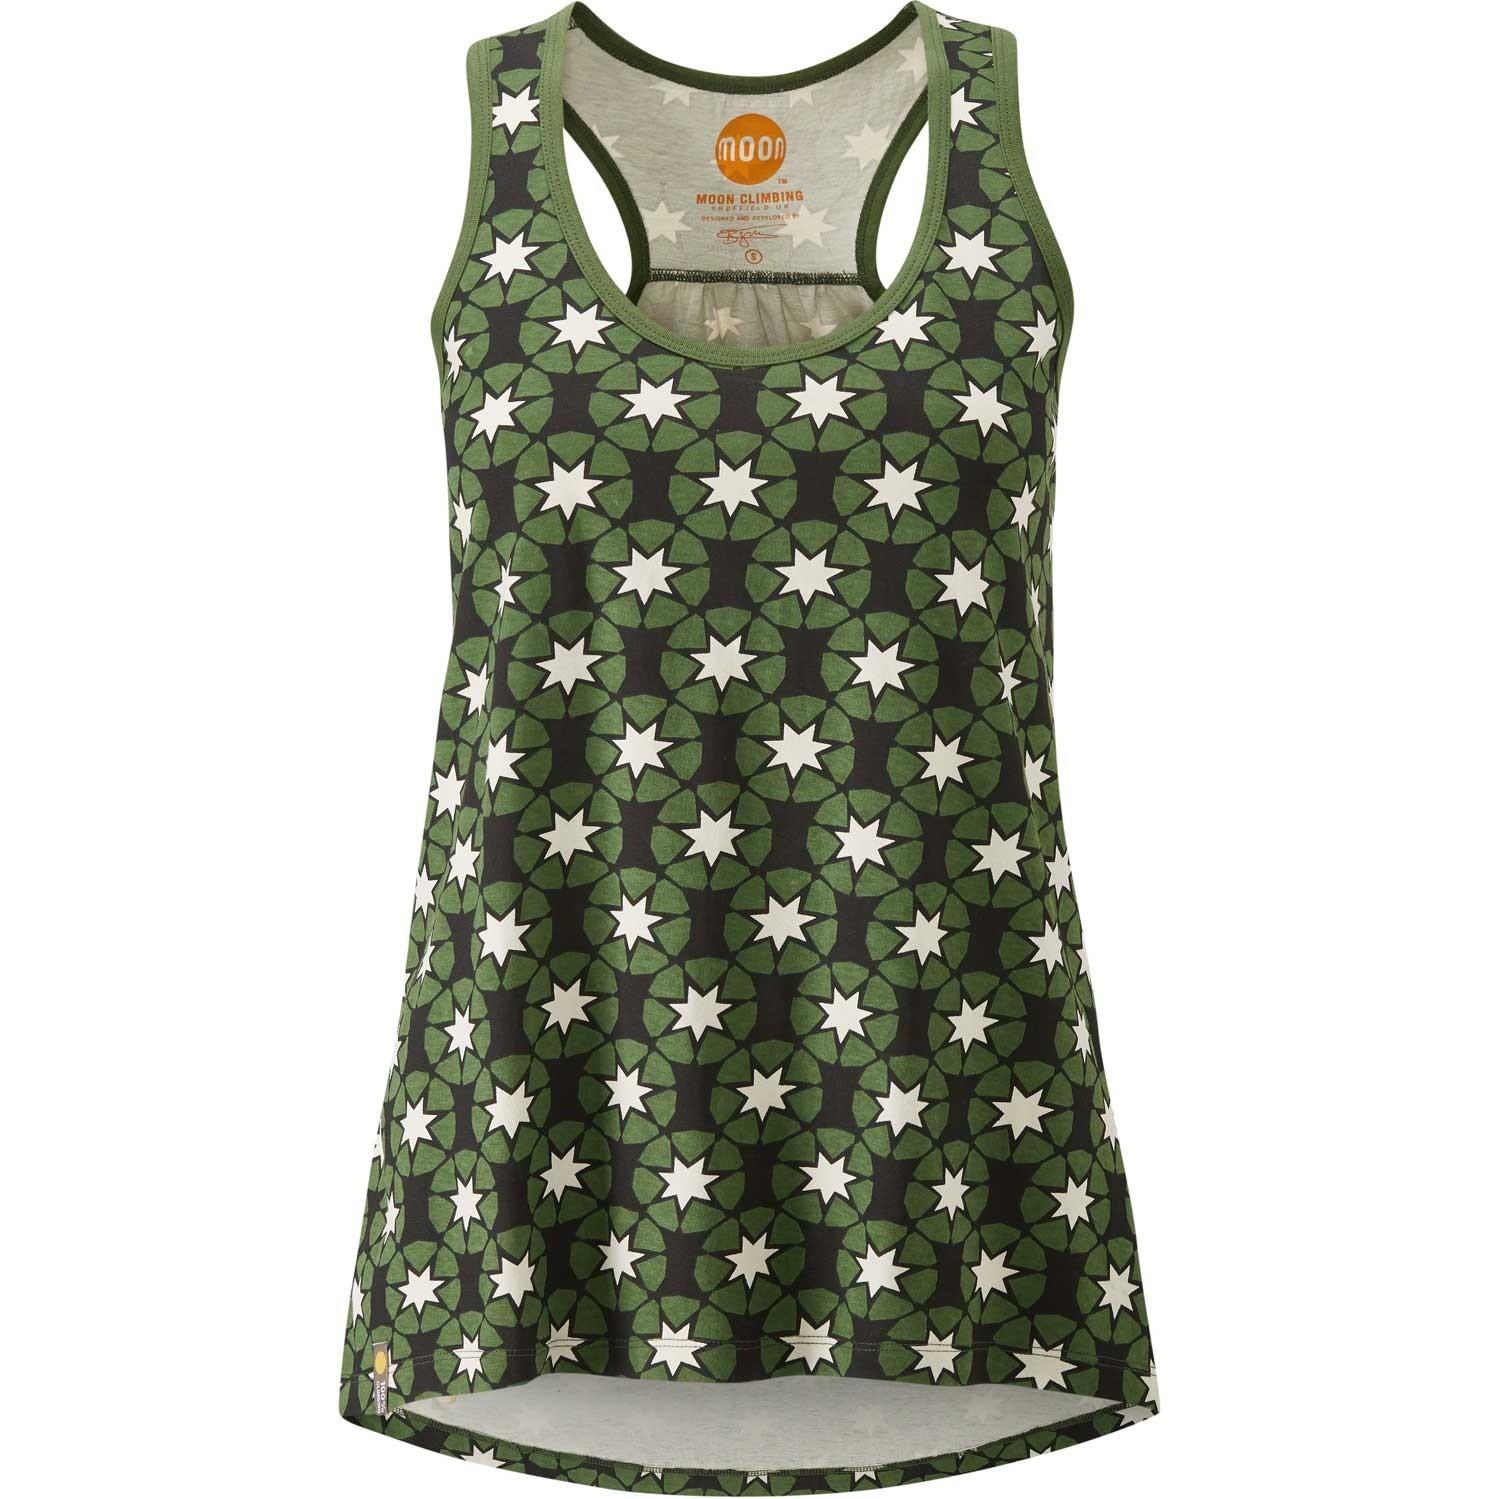 Moon Starflower Vest - Women's - Stone/Black